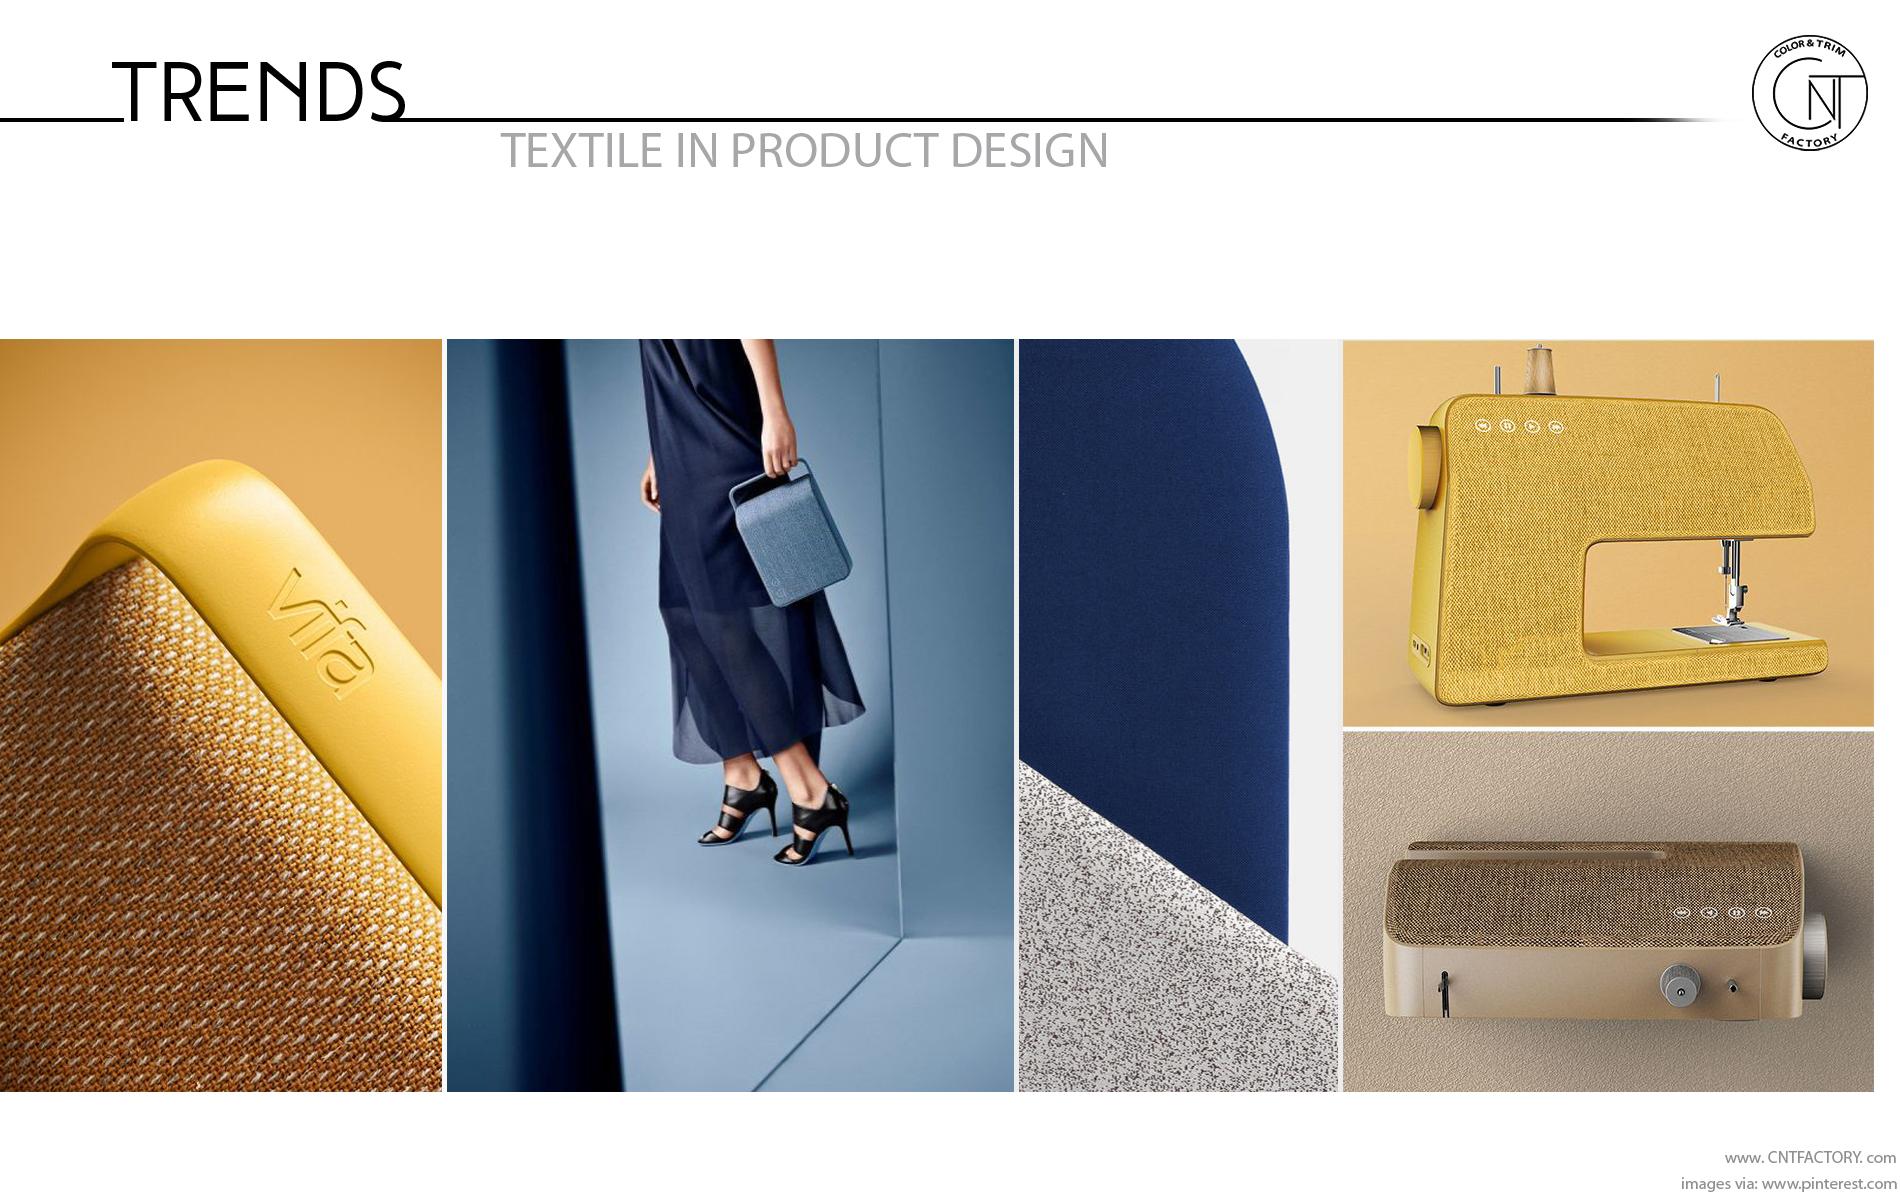 Textile Product Design